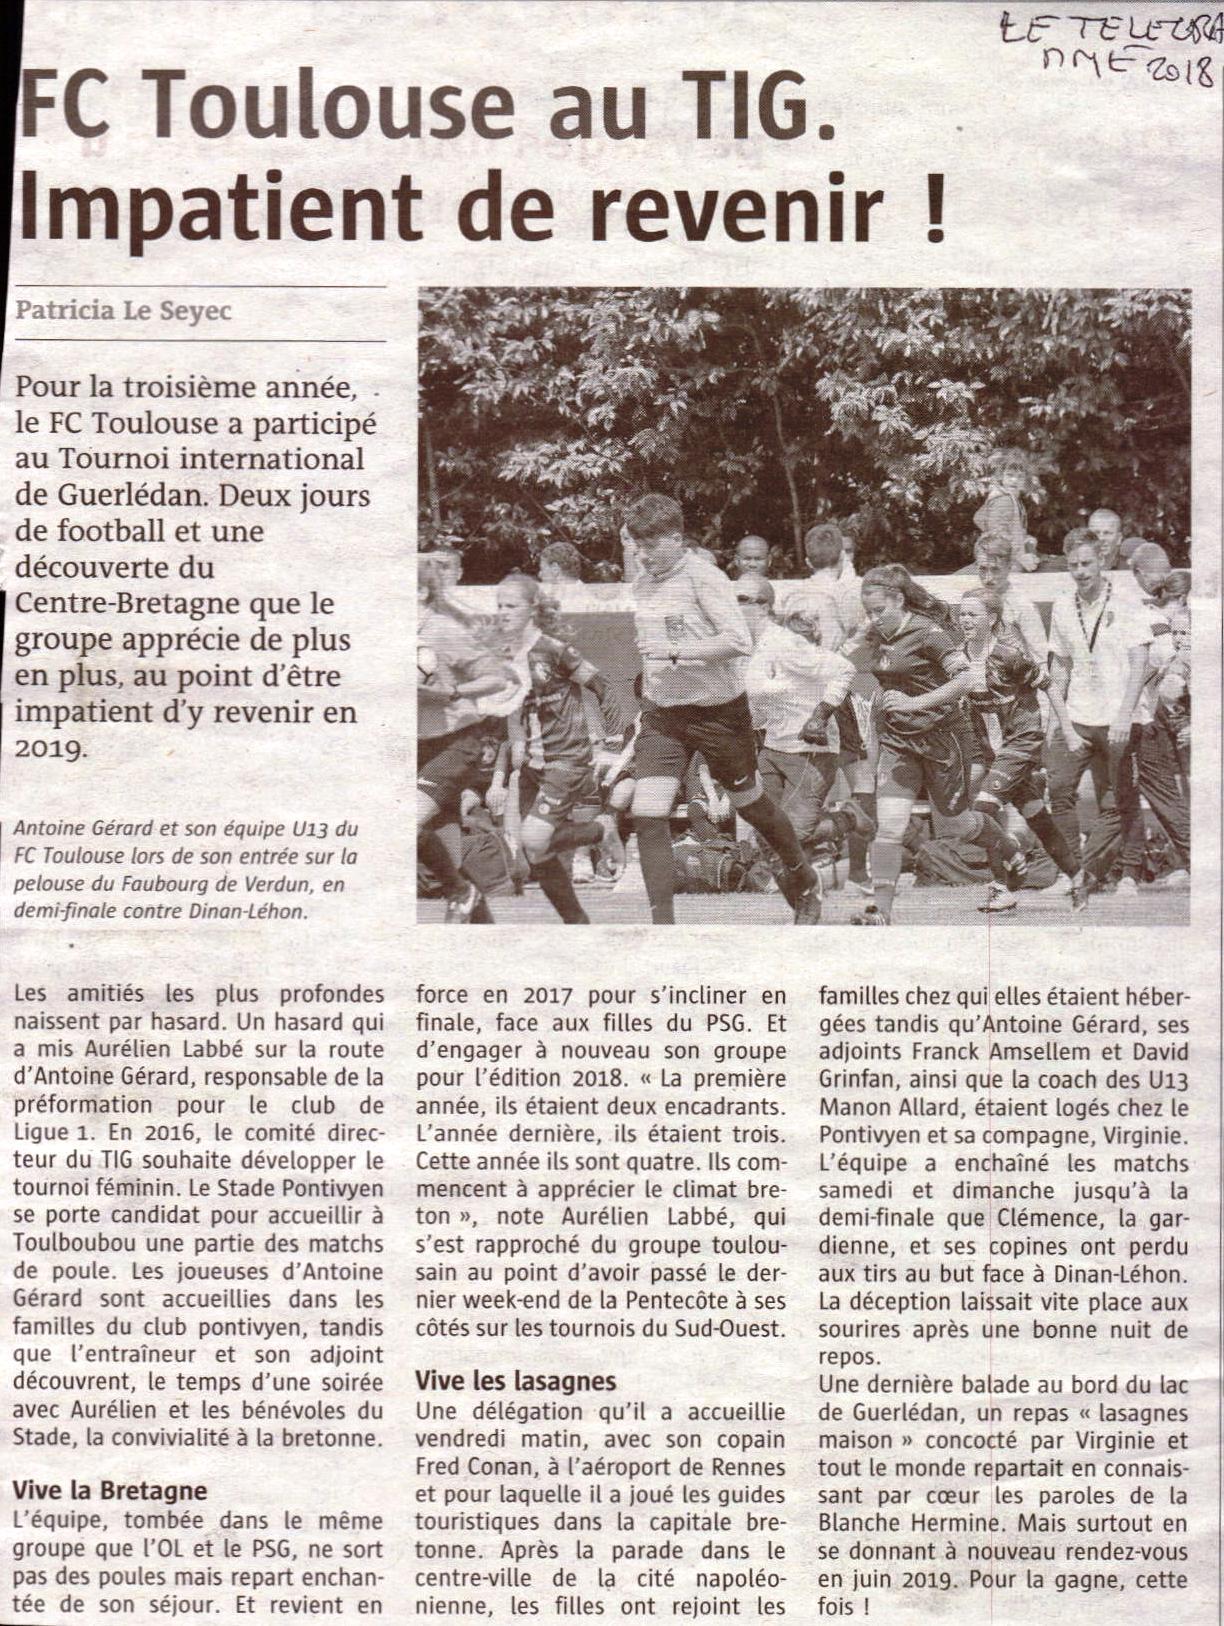 presse2018-fc_toulouse